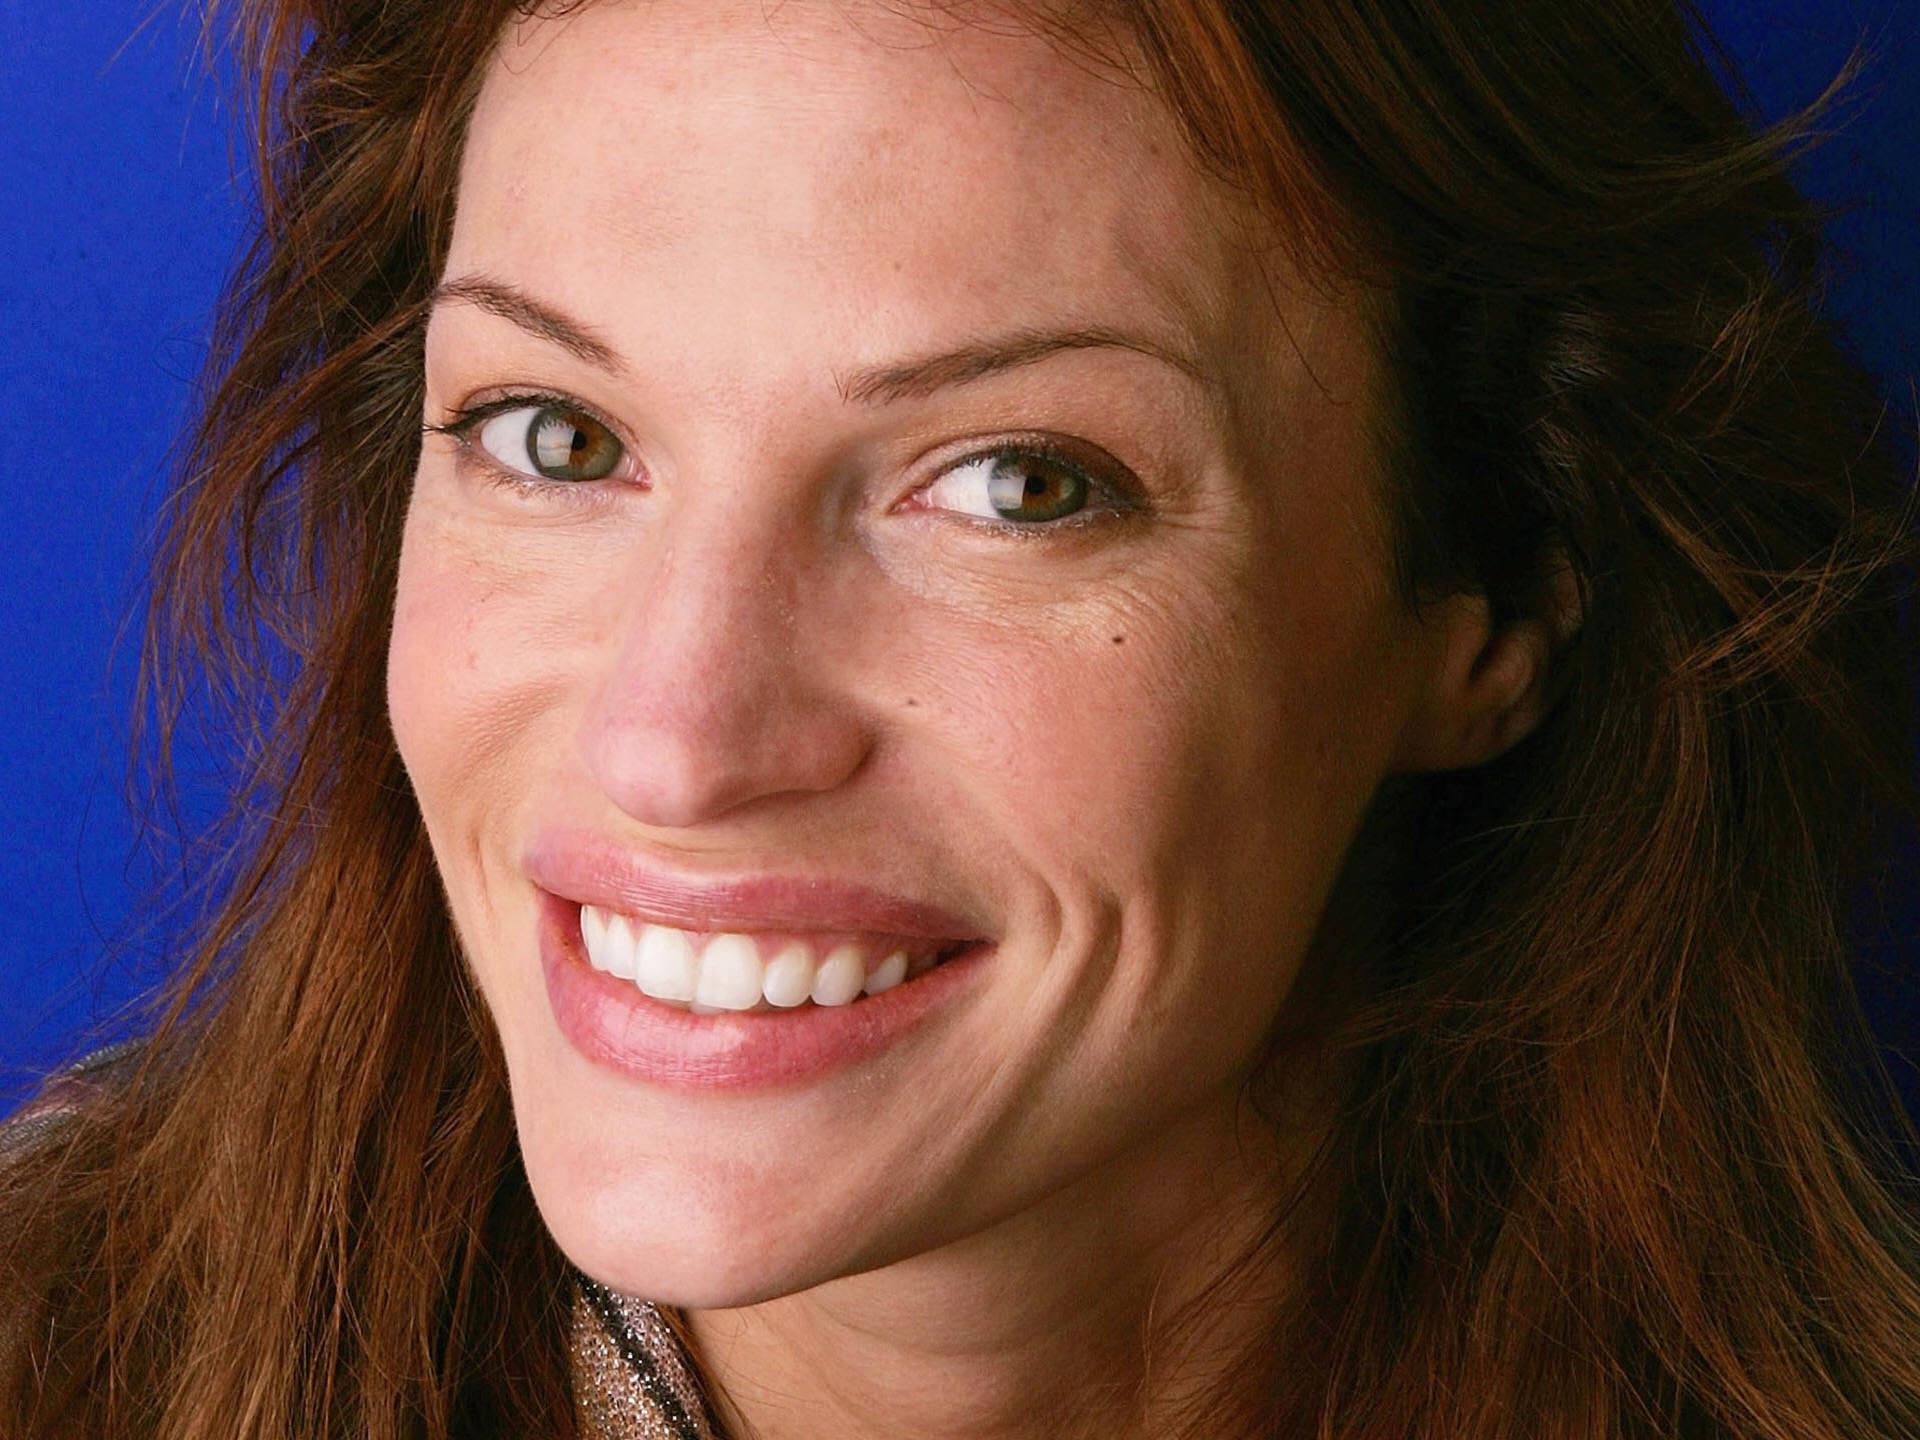 Poze rezolutie mare Jolene Blalock - Actor - Poza 89 din